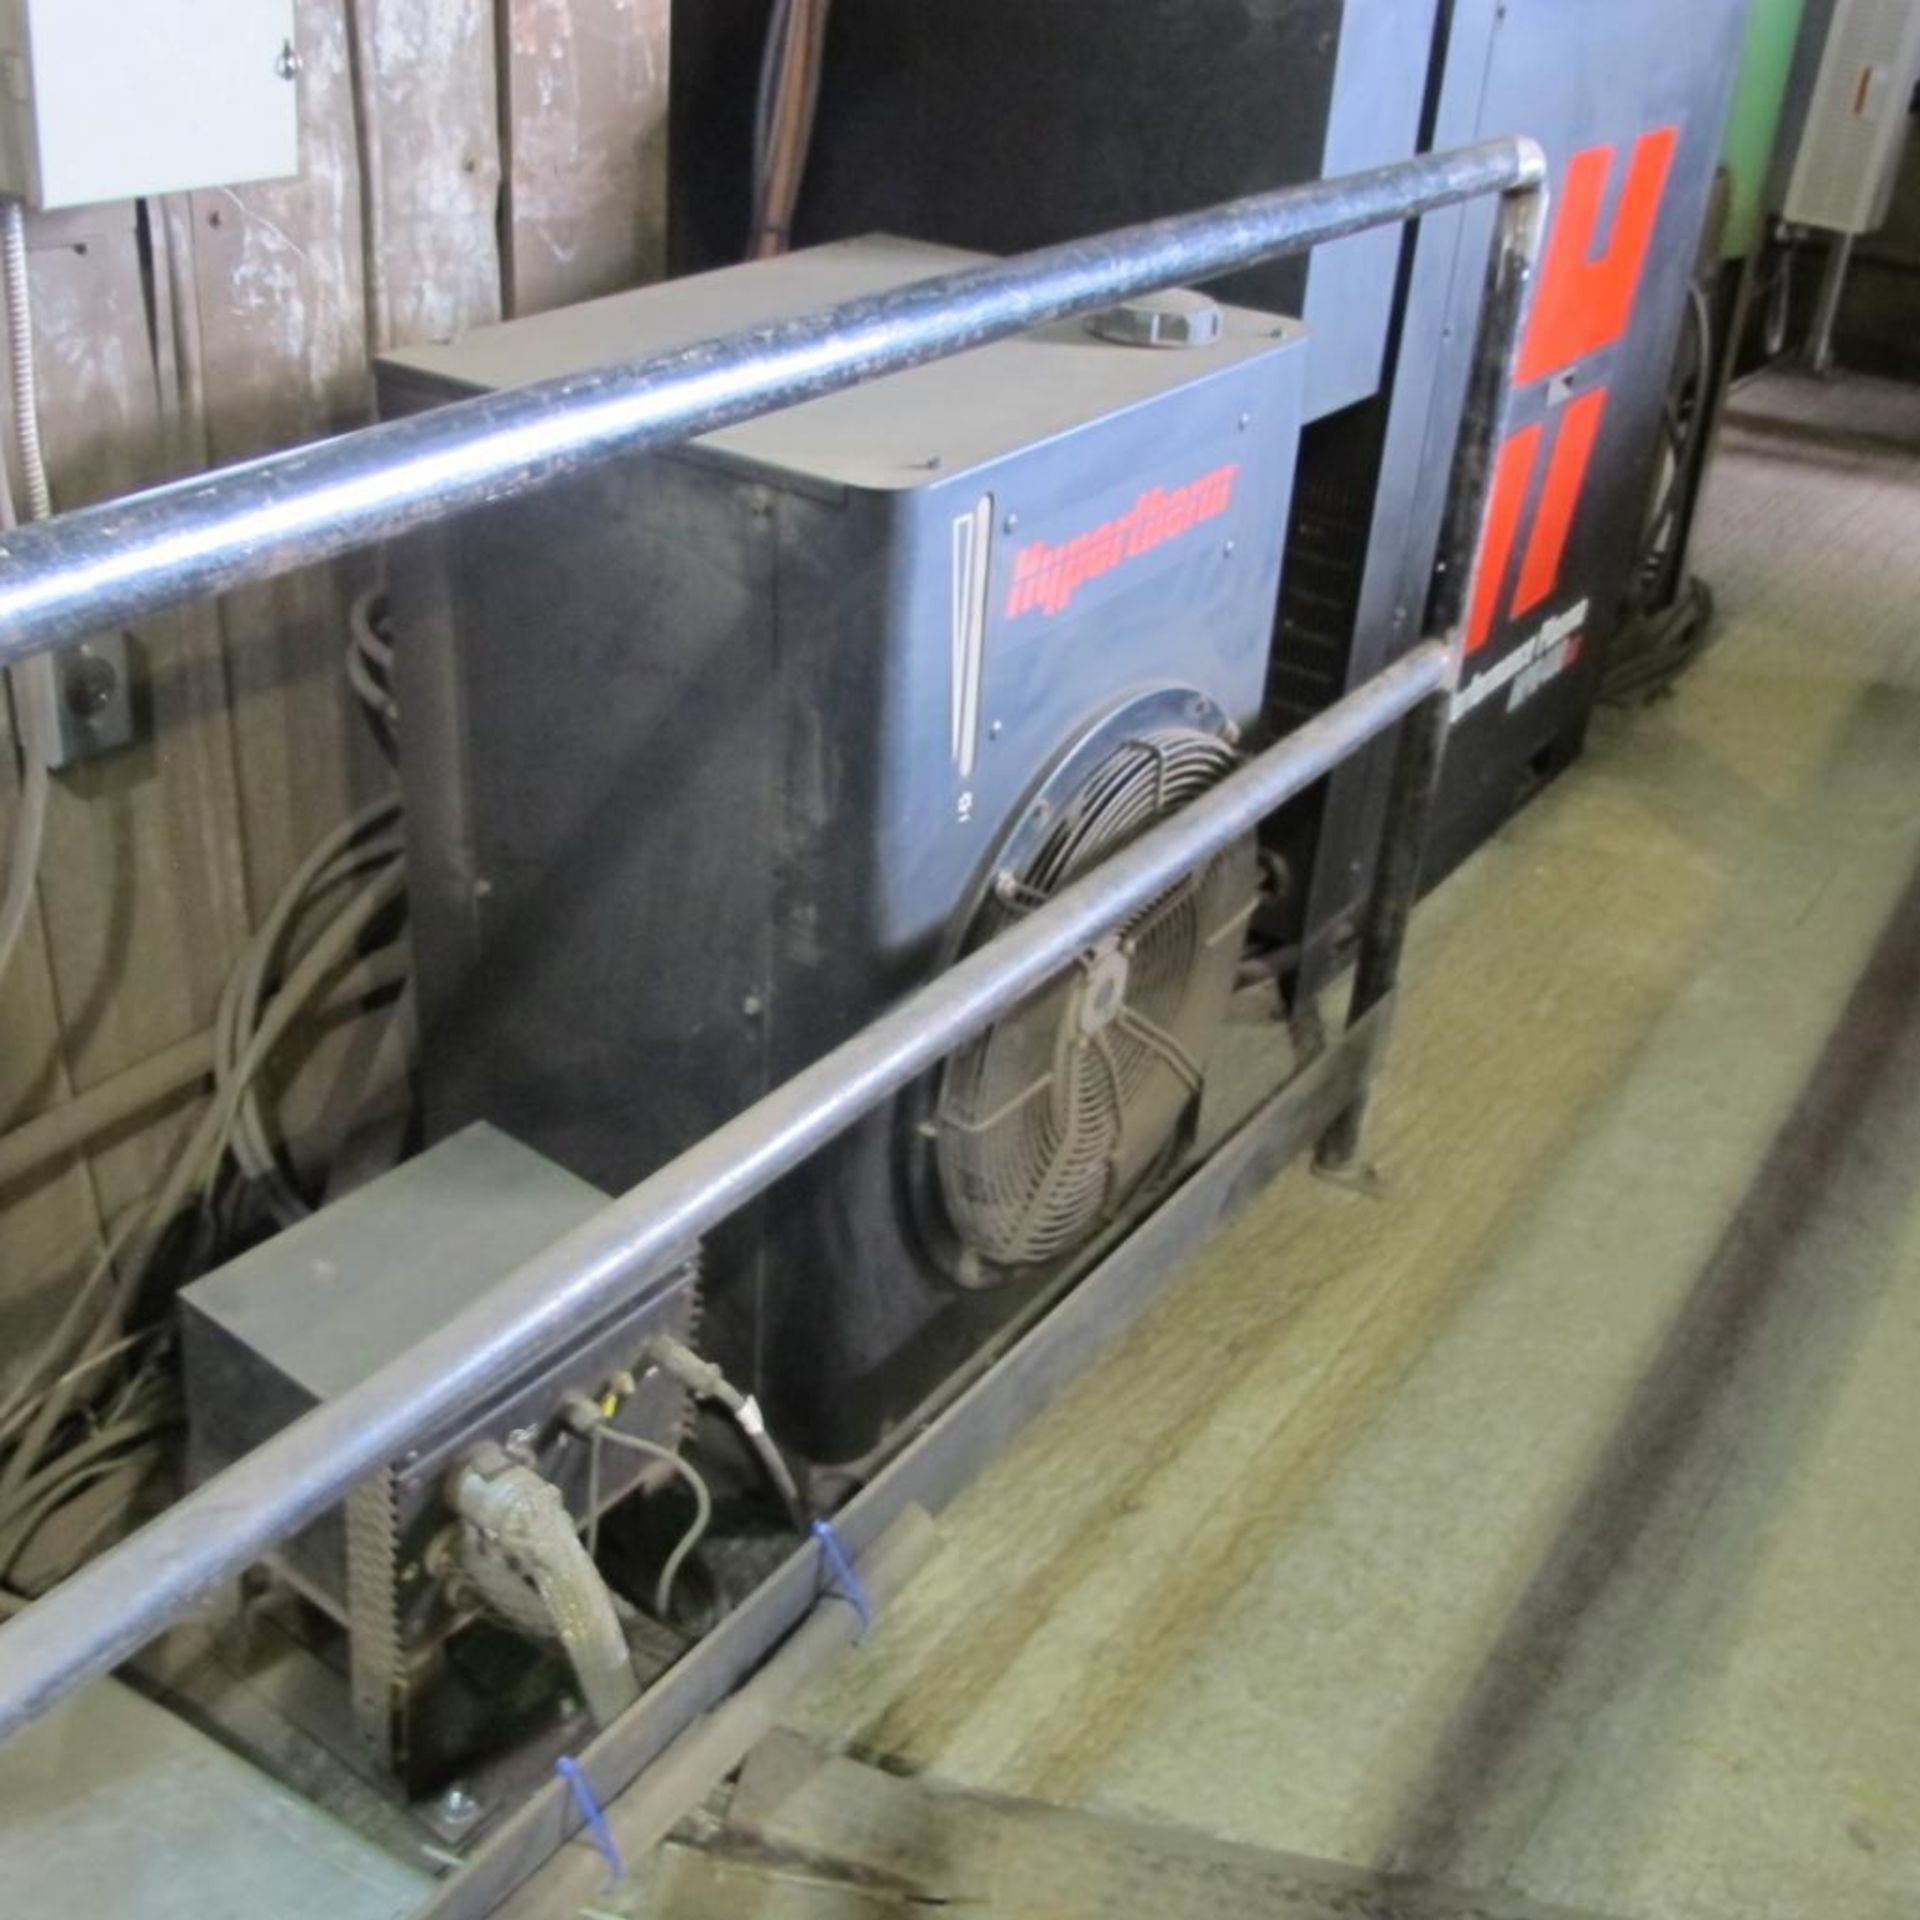 "Lot 403 - SECTOR CNC 9'4"" x 21'6"" PLASMA CUTTING TABLE, MODEL PROSTAR PRS-200, BURNY MODEL PHANTOM CNC CONTROL"